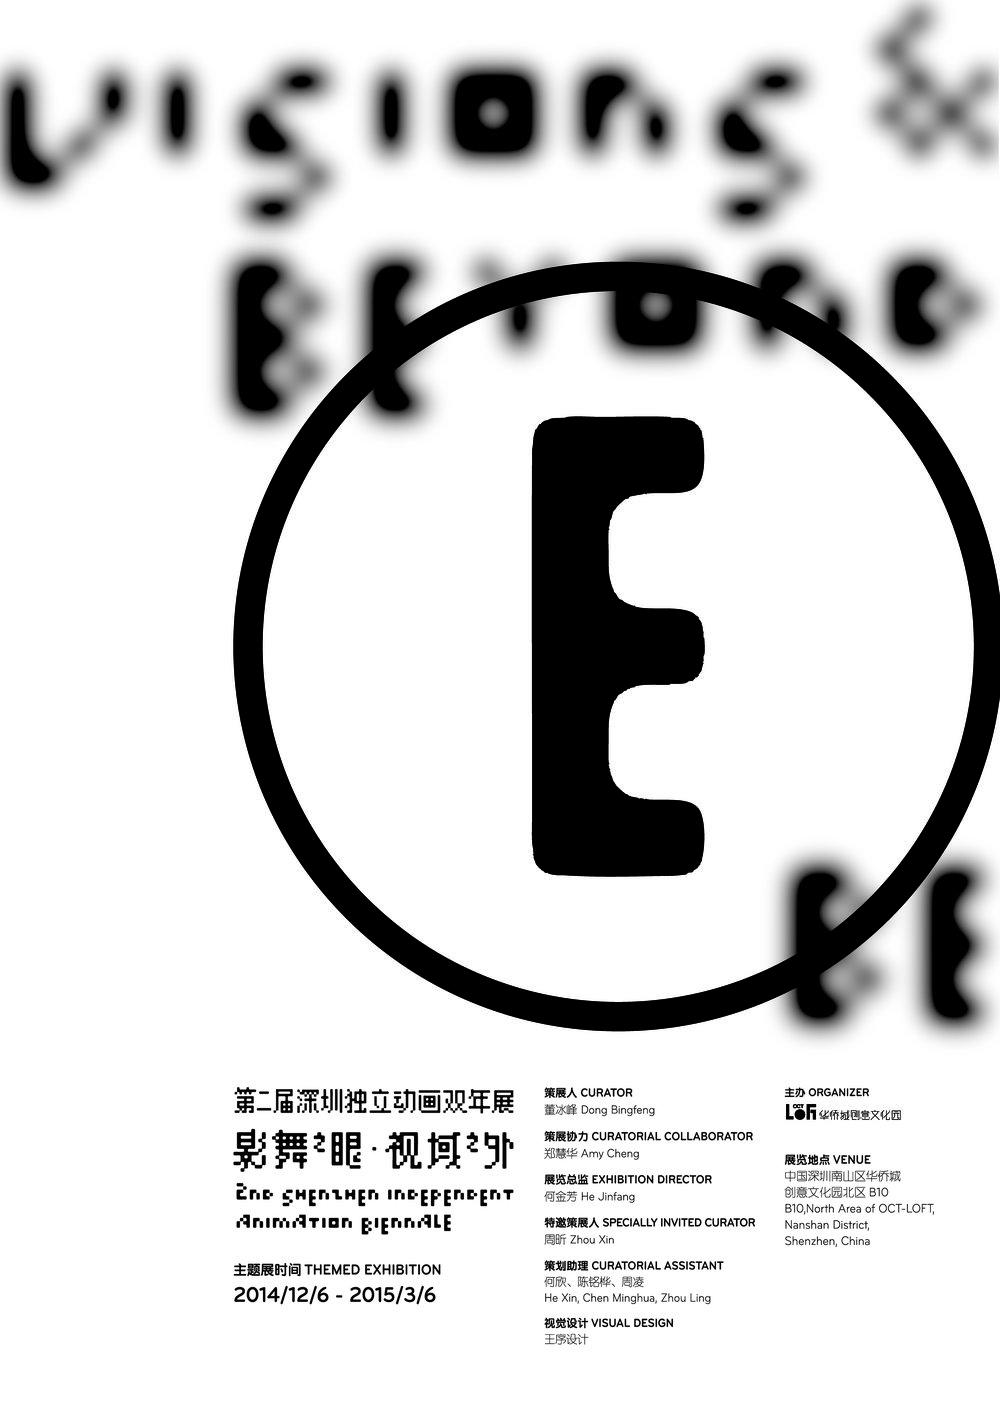 第二届深圳独立动画双年展 Second Shenzhen Independent Animation Biennial  -